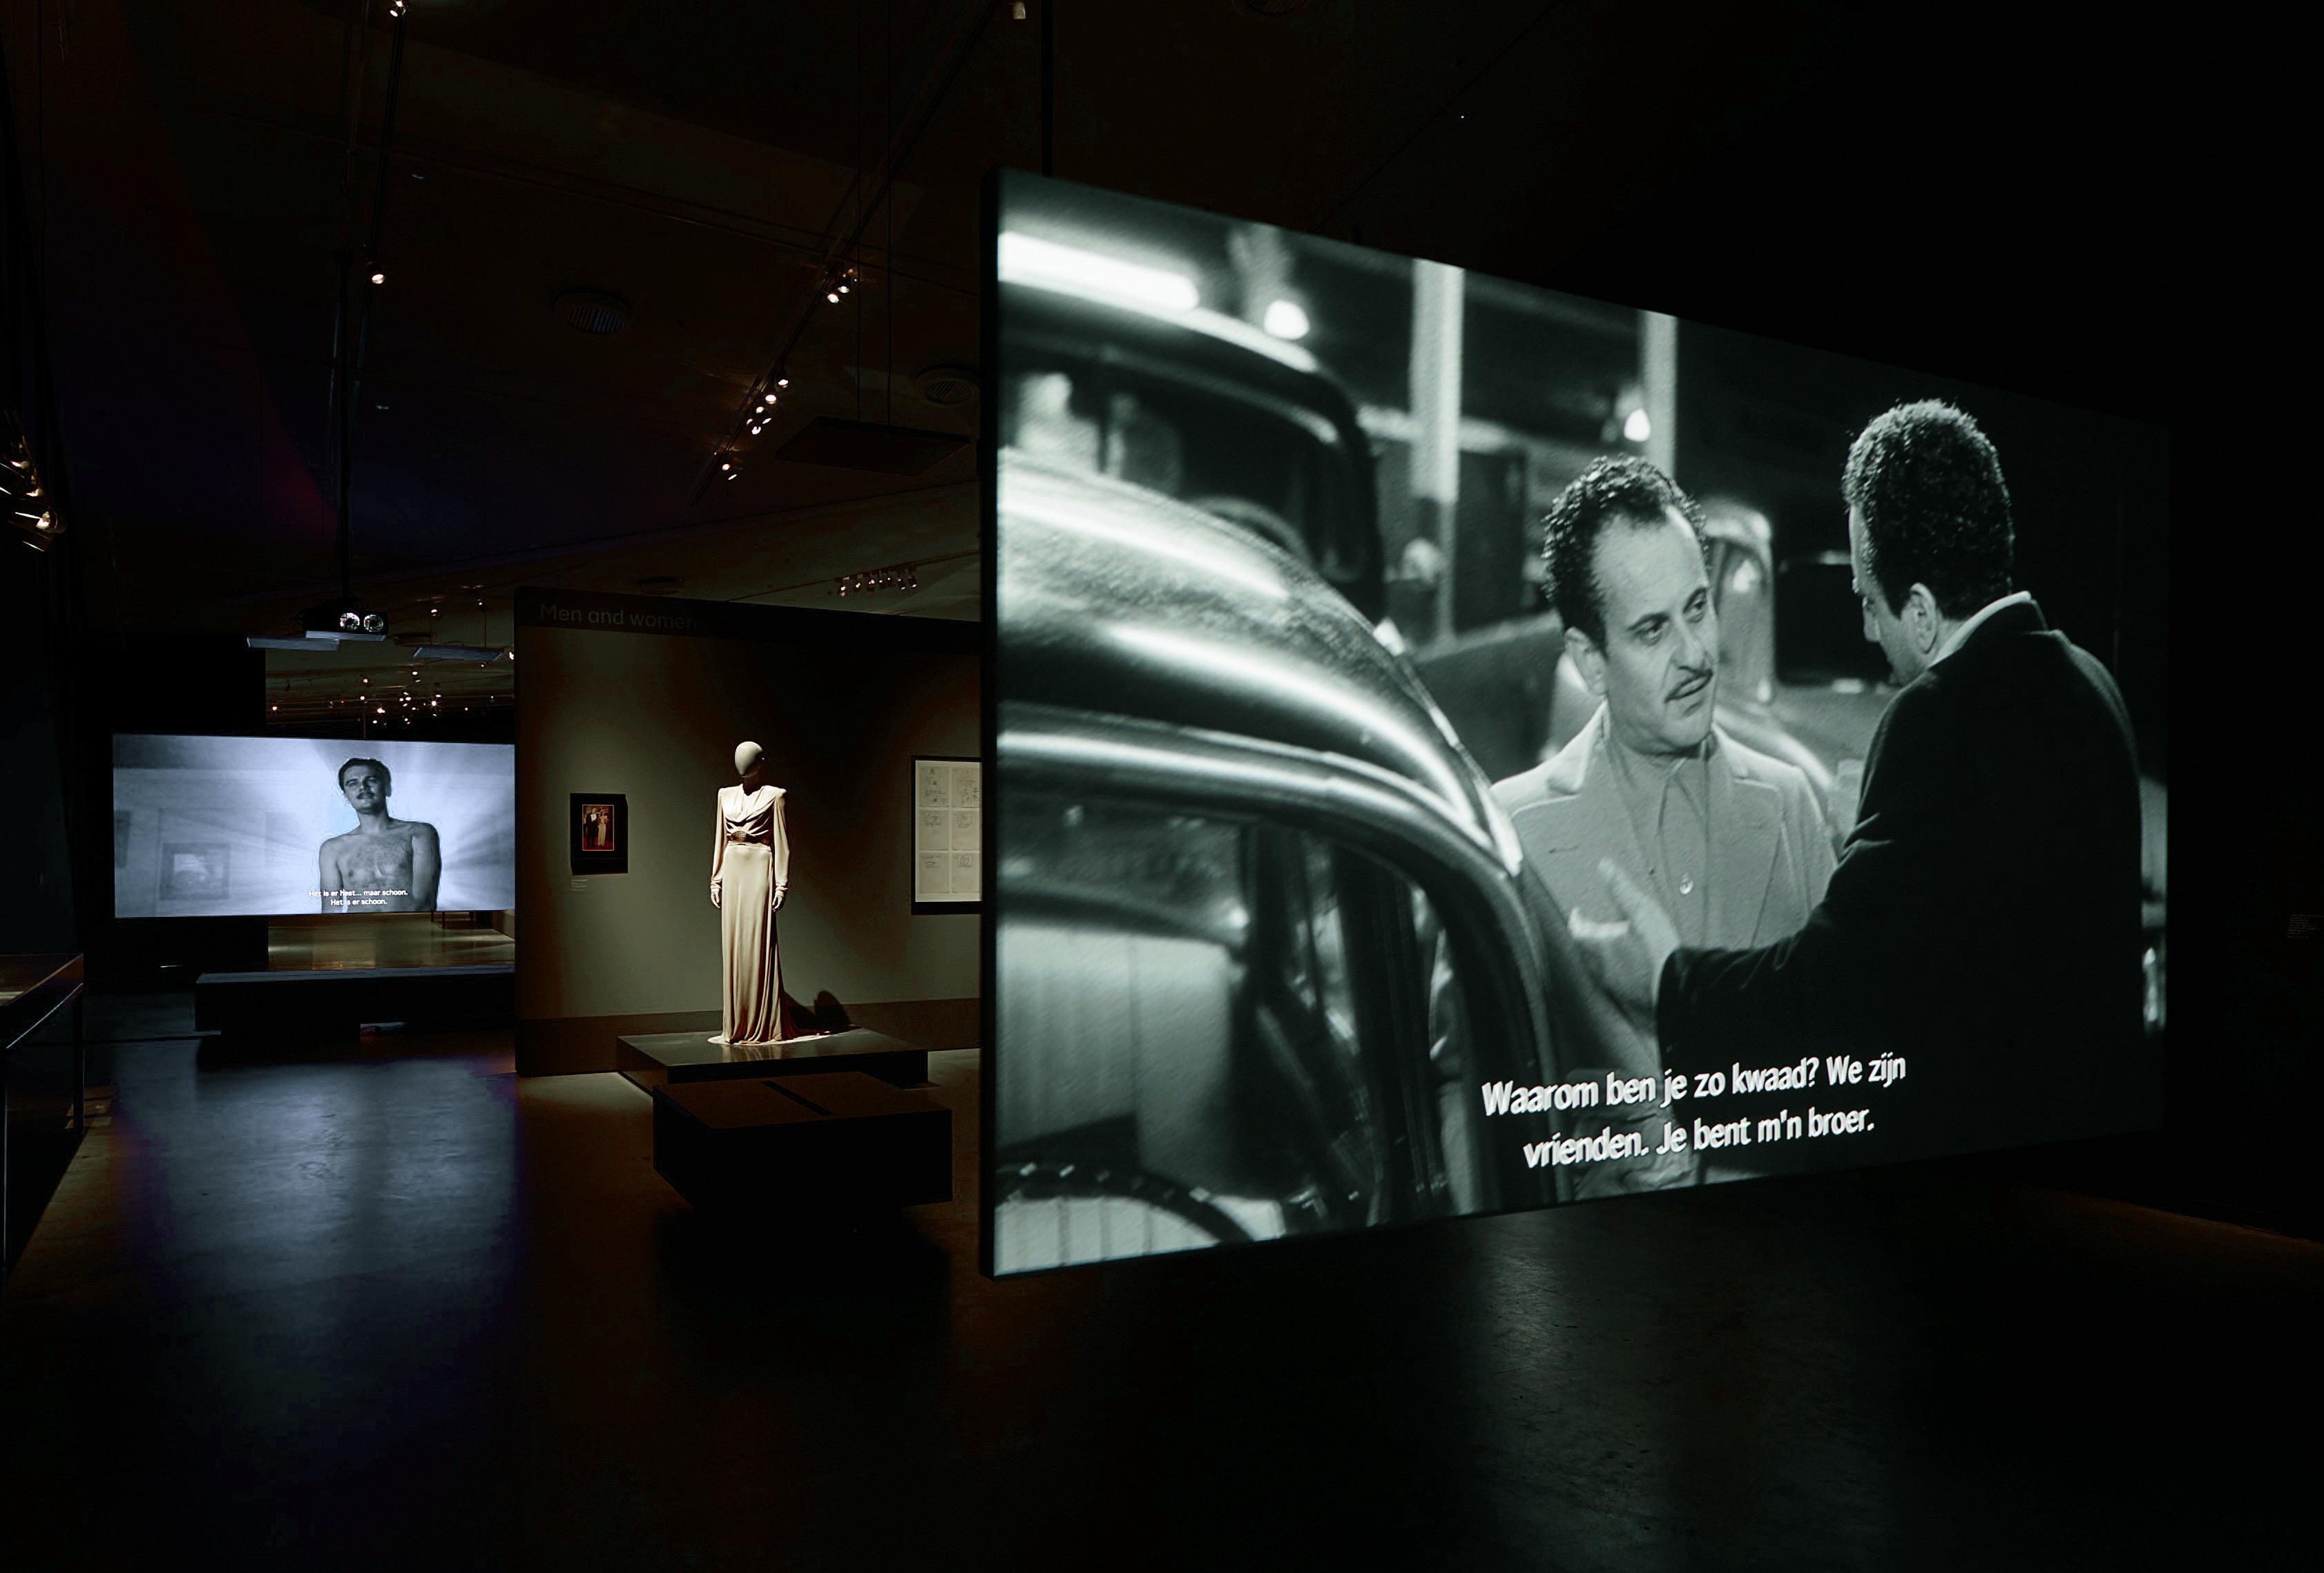 музеи Амстердама Видеть больше: Лучшие музеи Амстердама martinscorsesetheexhibitionstudiohanswilschutcf007786hh